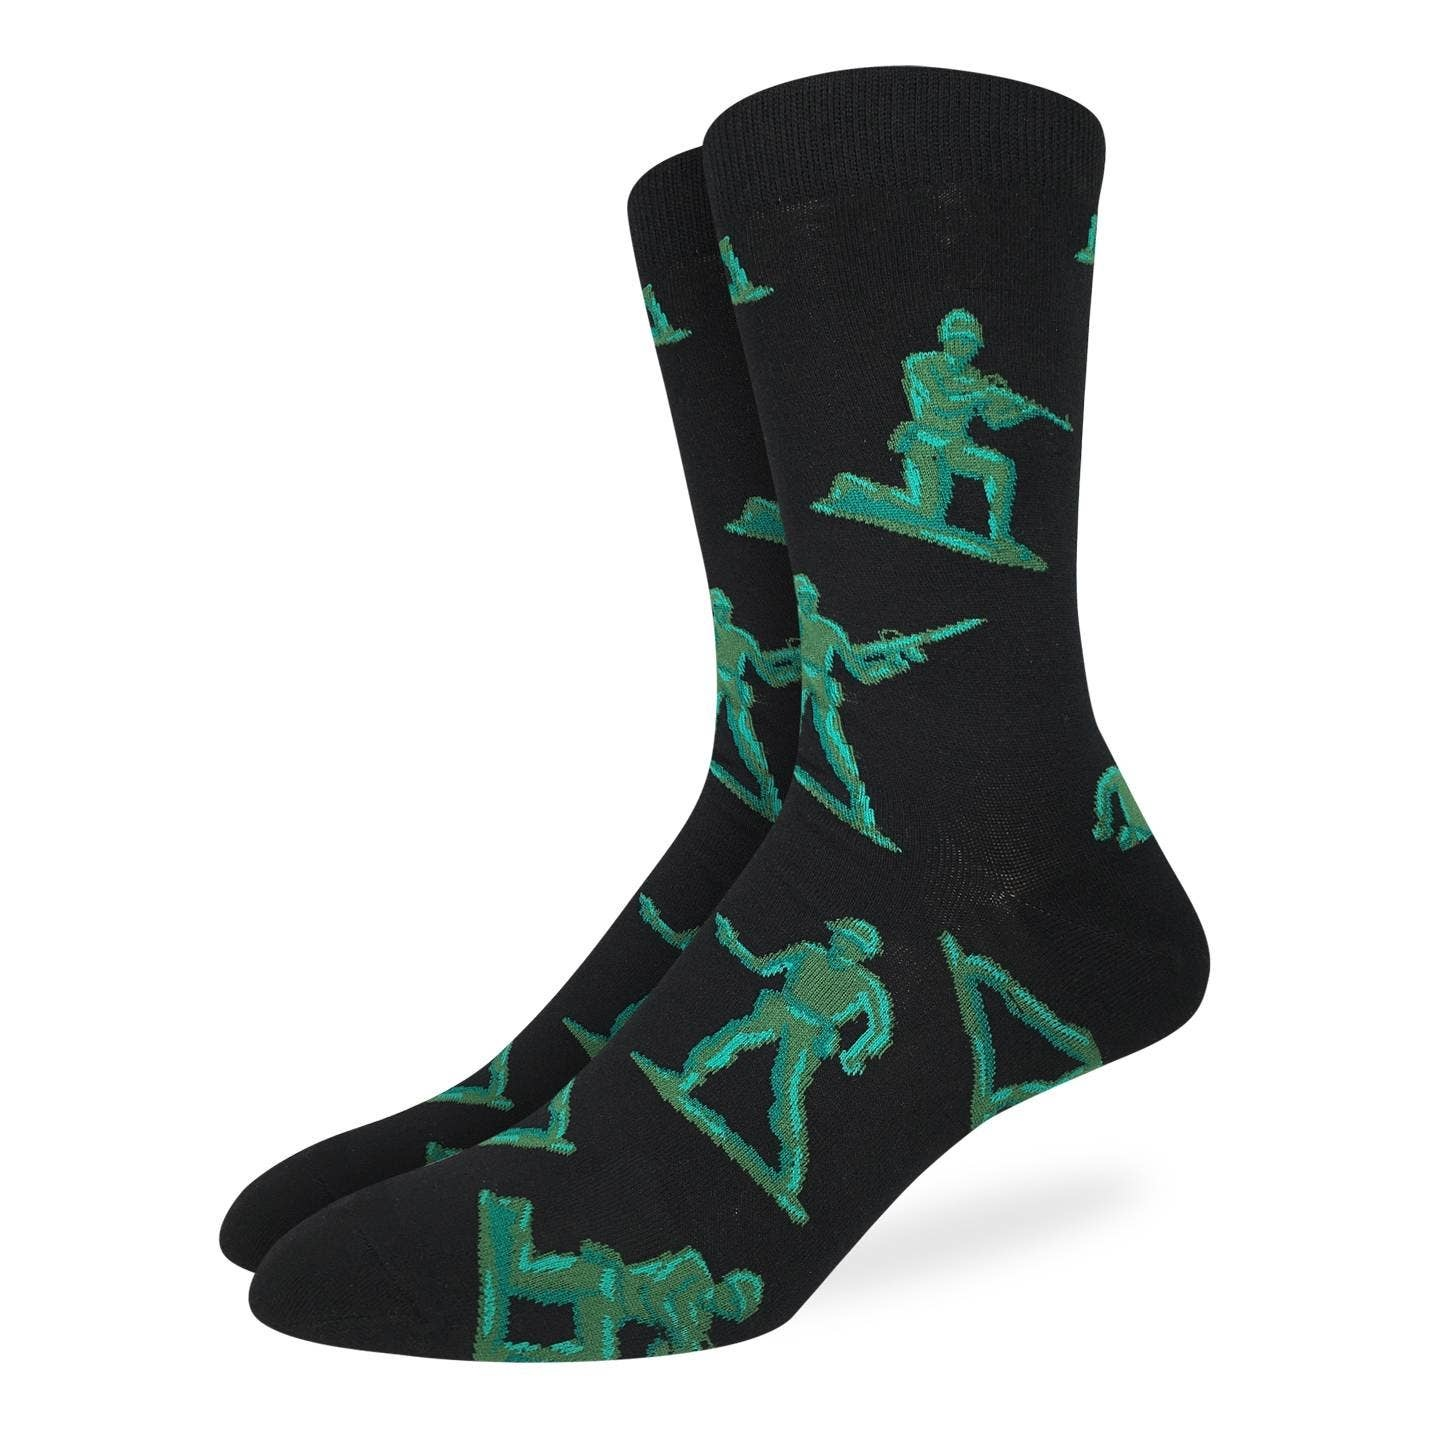 Toy Soldiers Men's Crew Socks